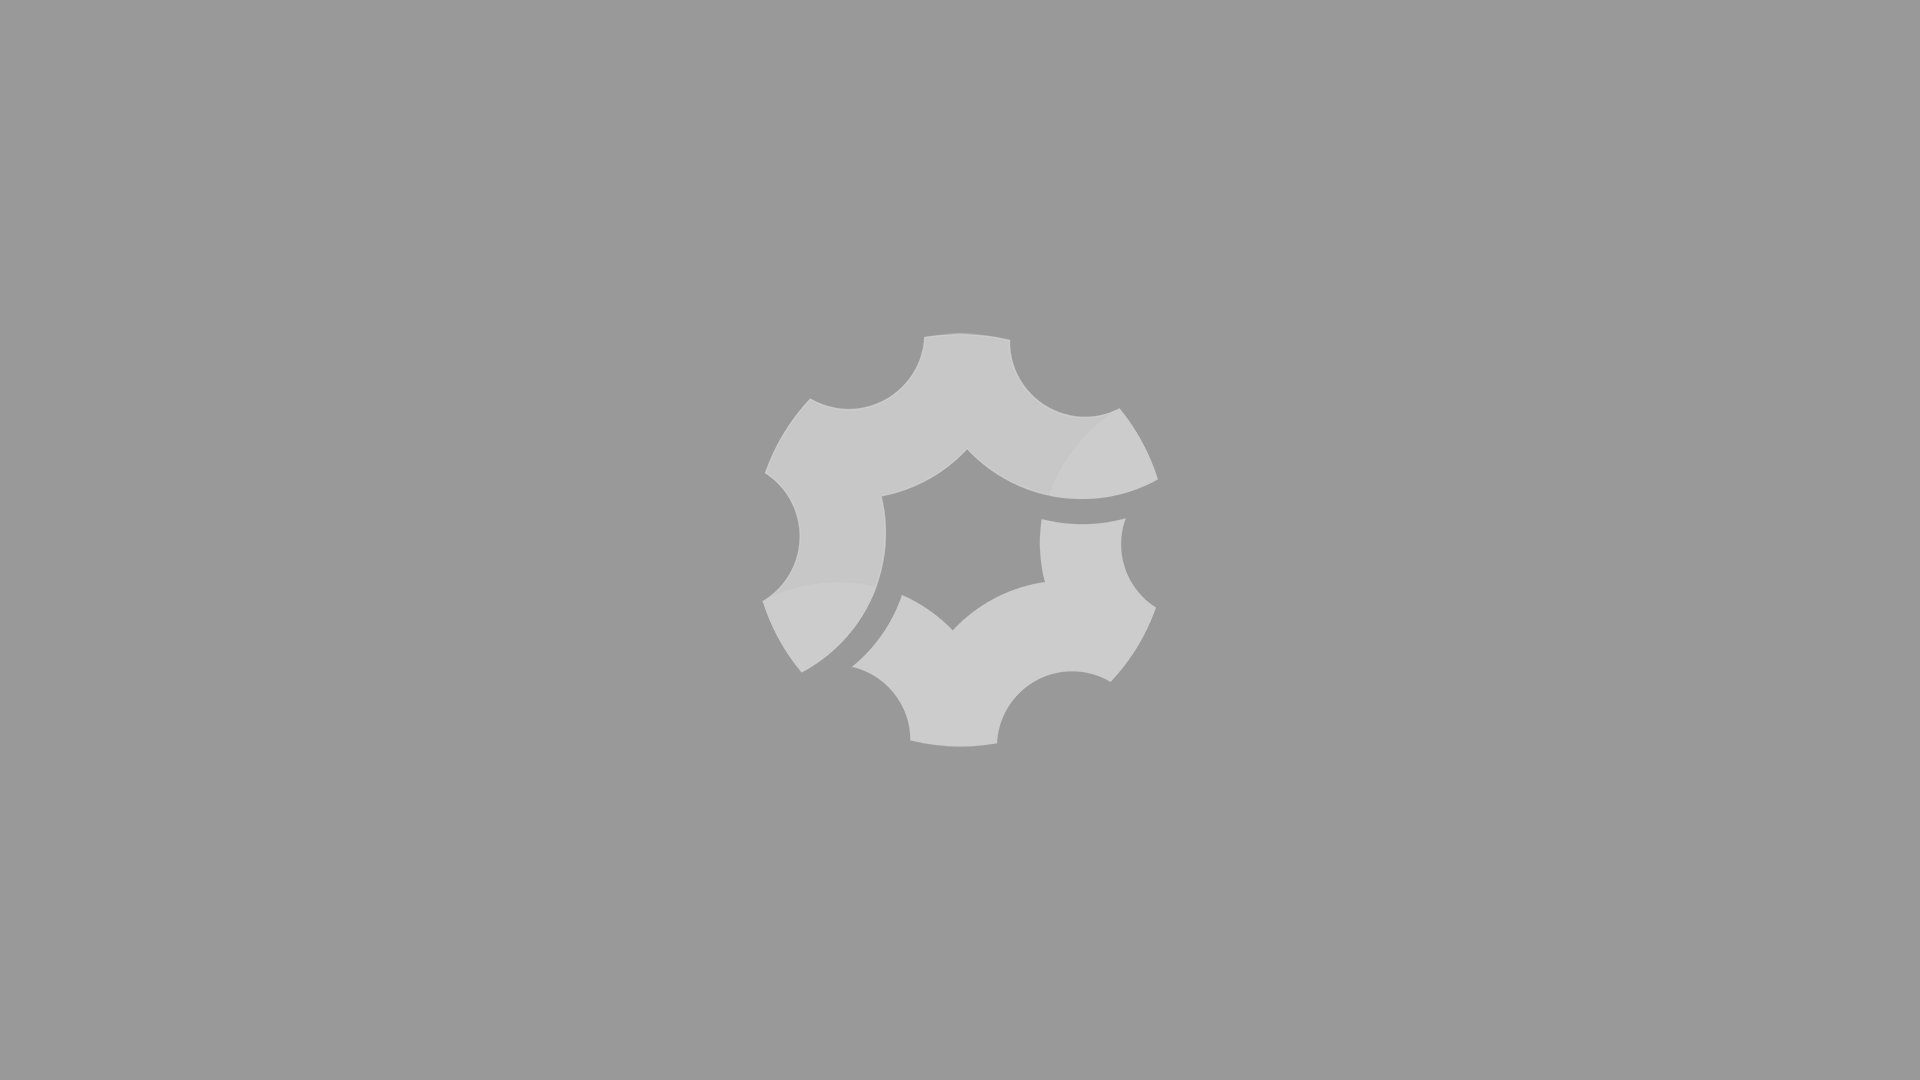 new_bitmap_image1.bmp_thumbdds.png